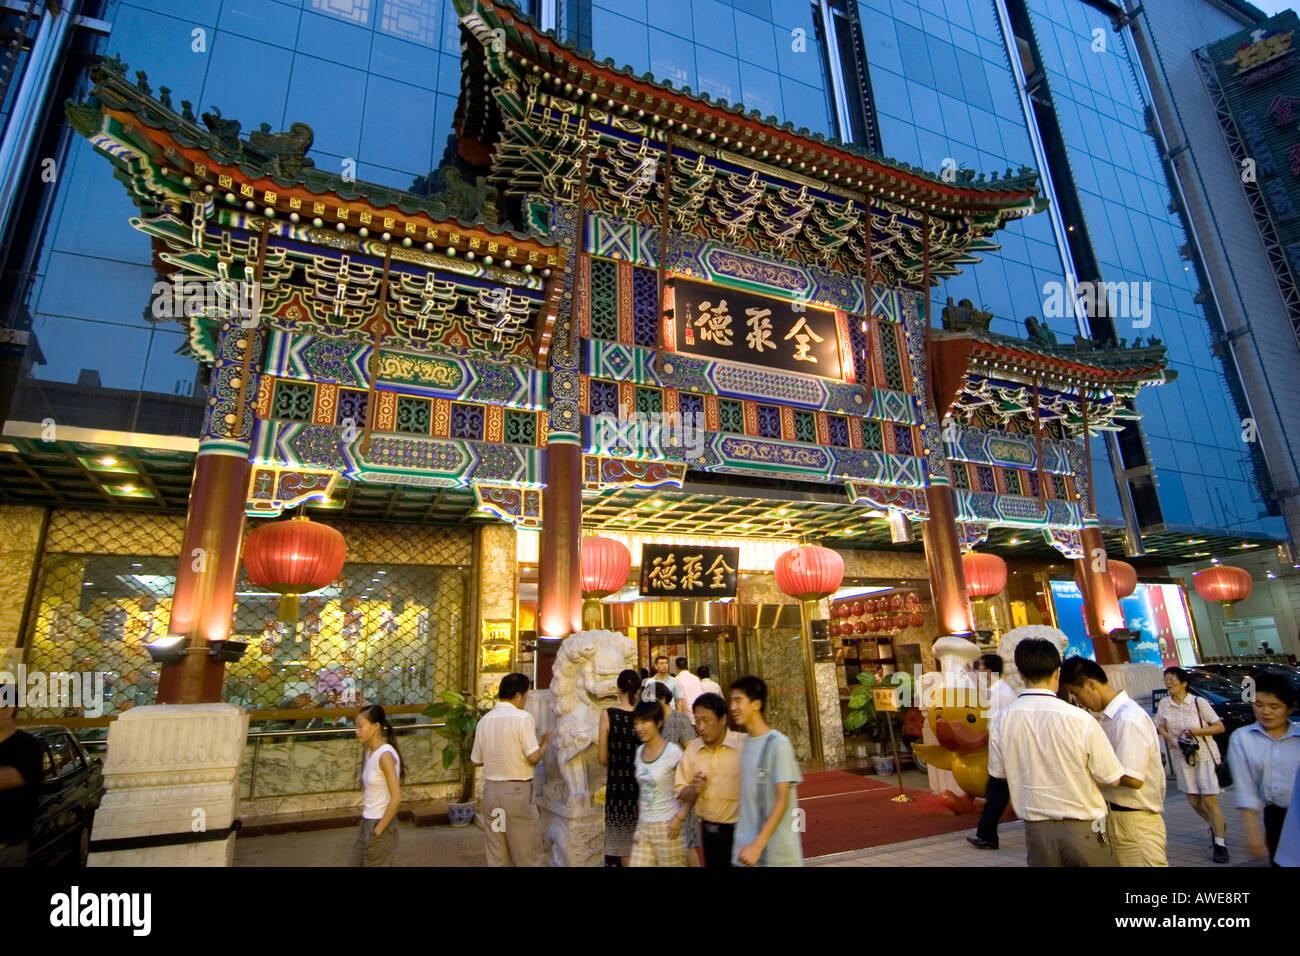 Modern department stores at wangfujing dajie in peking, china, asia - Stock Image